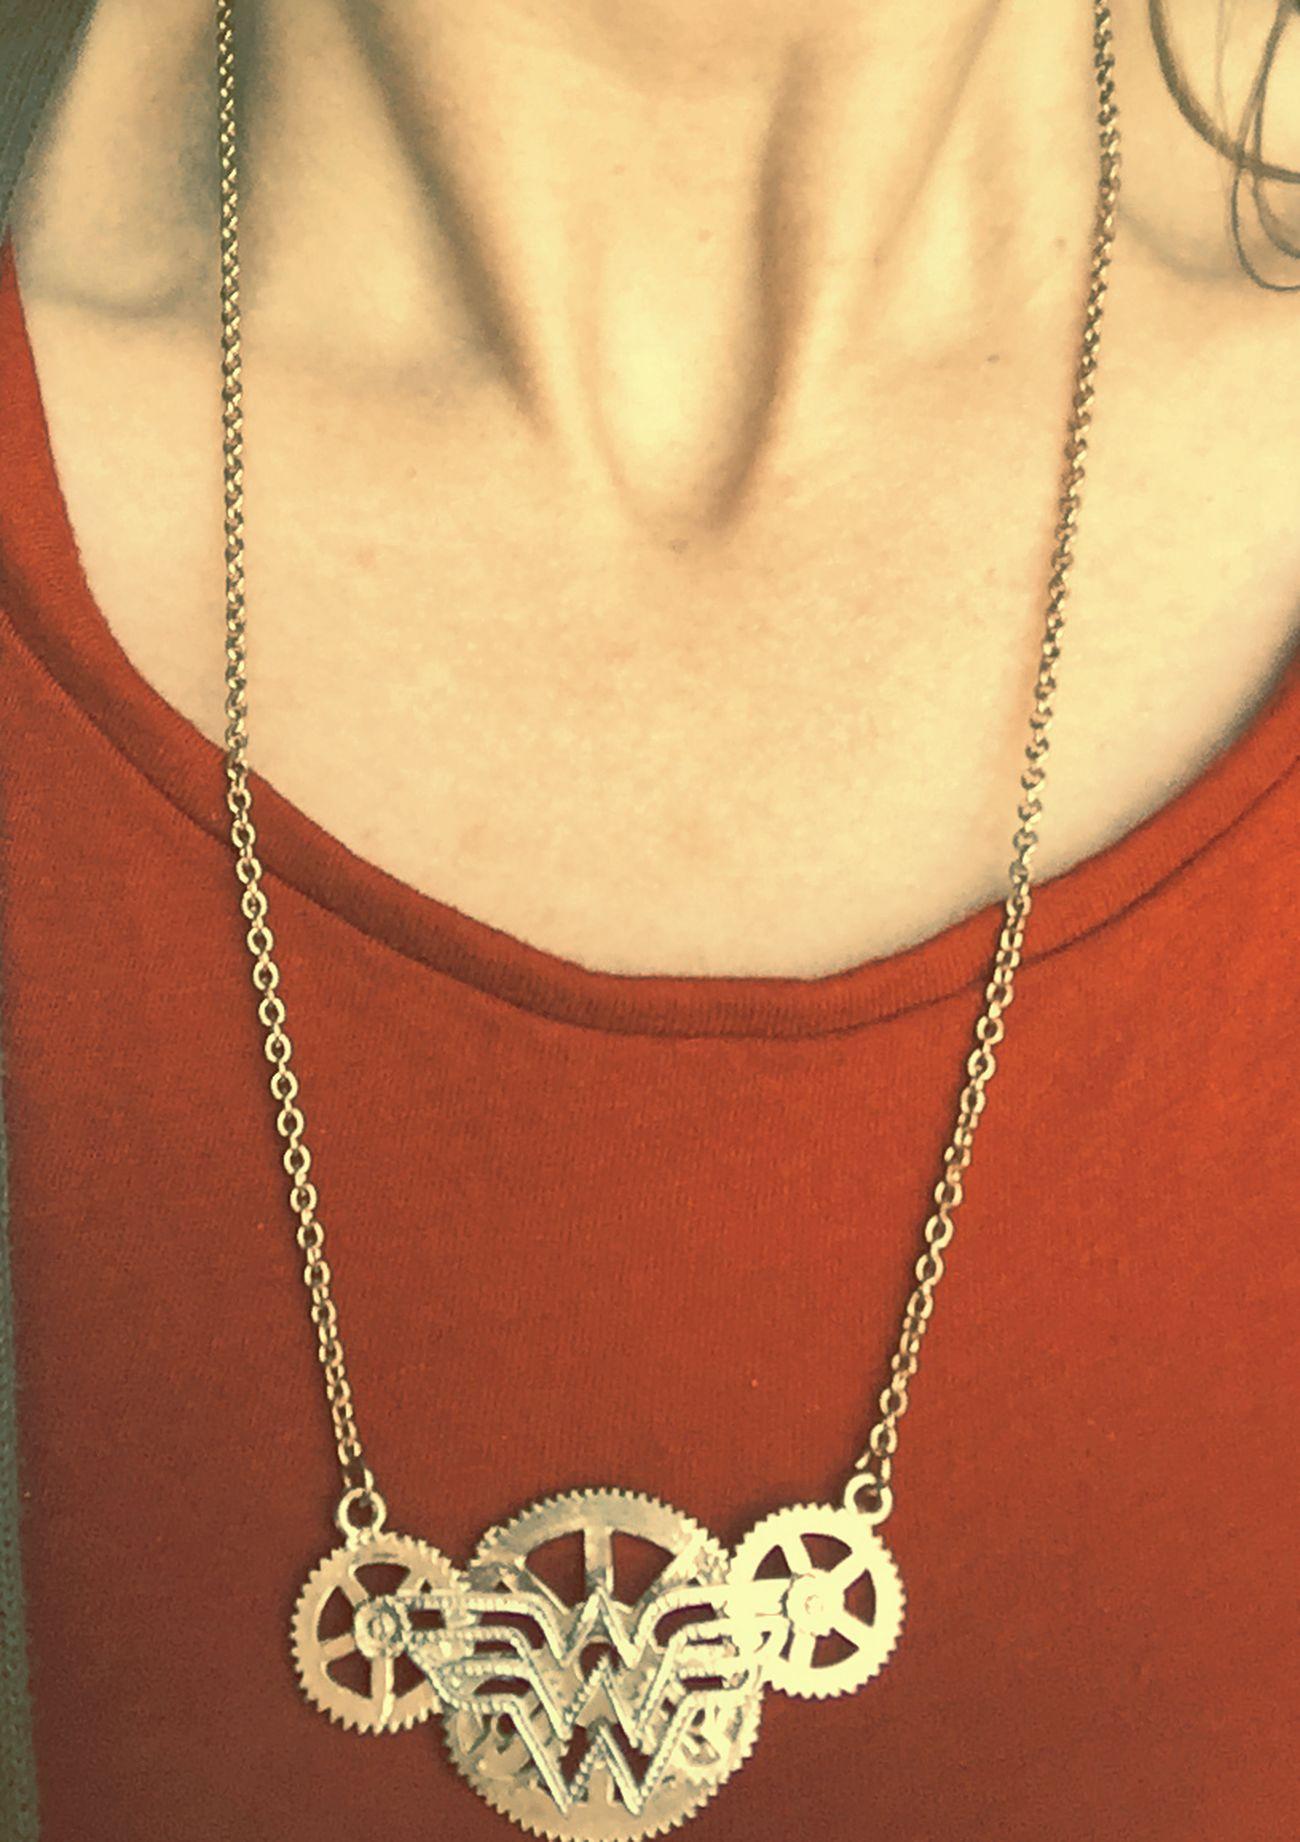 Actually, yes, I am Wonder Woman ! Wonderwoman Wonderwoman💪 Necklace ♥ 😜✨ Kicking Ass.